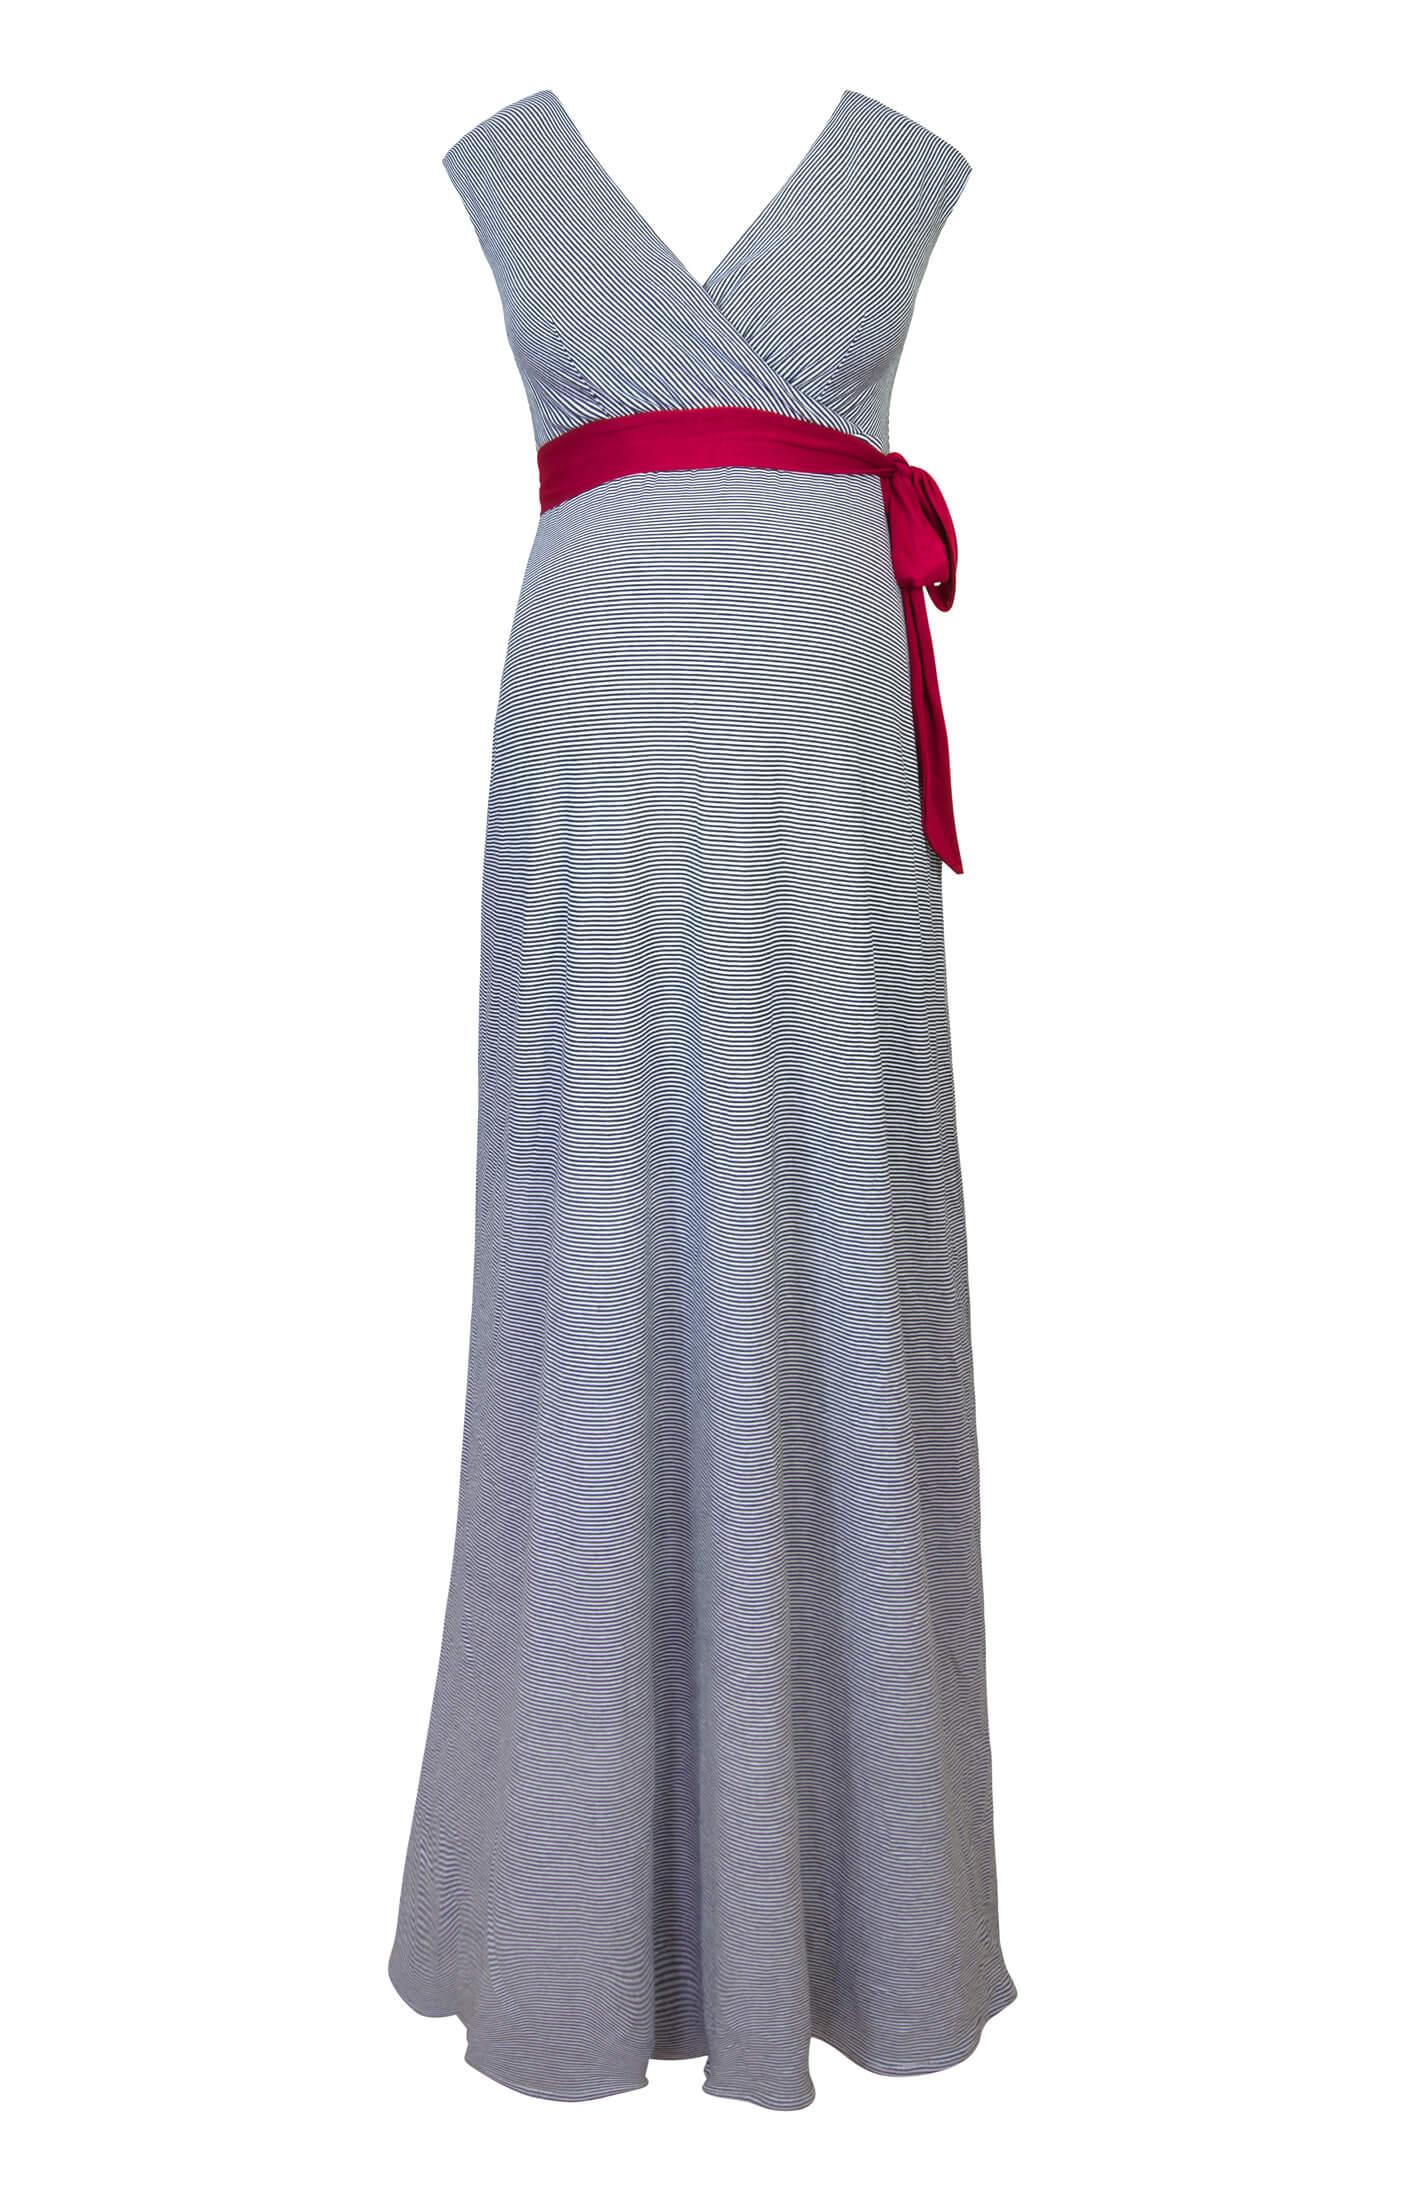 a0239018d77 Alana Maternity Maxi Dress Cruise Stripe - Maternity Wedding Dresses ...